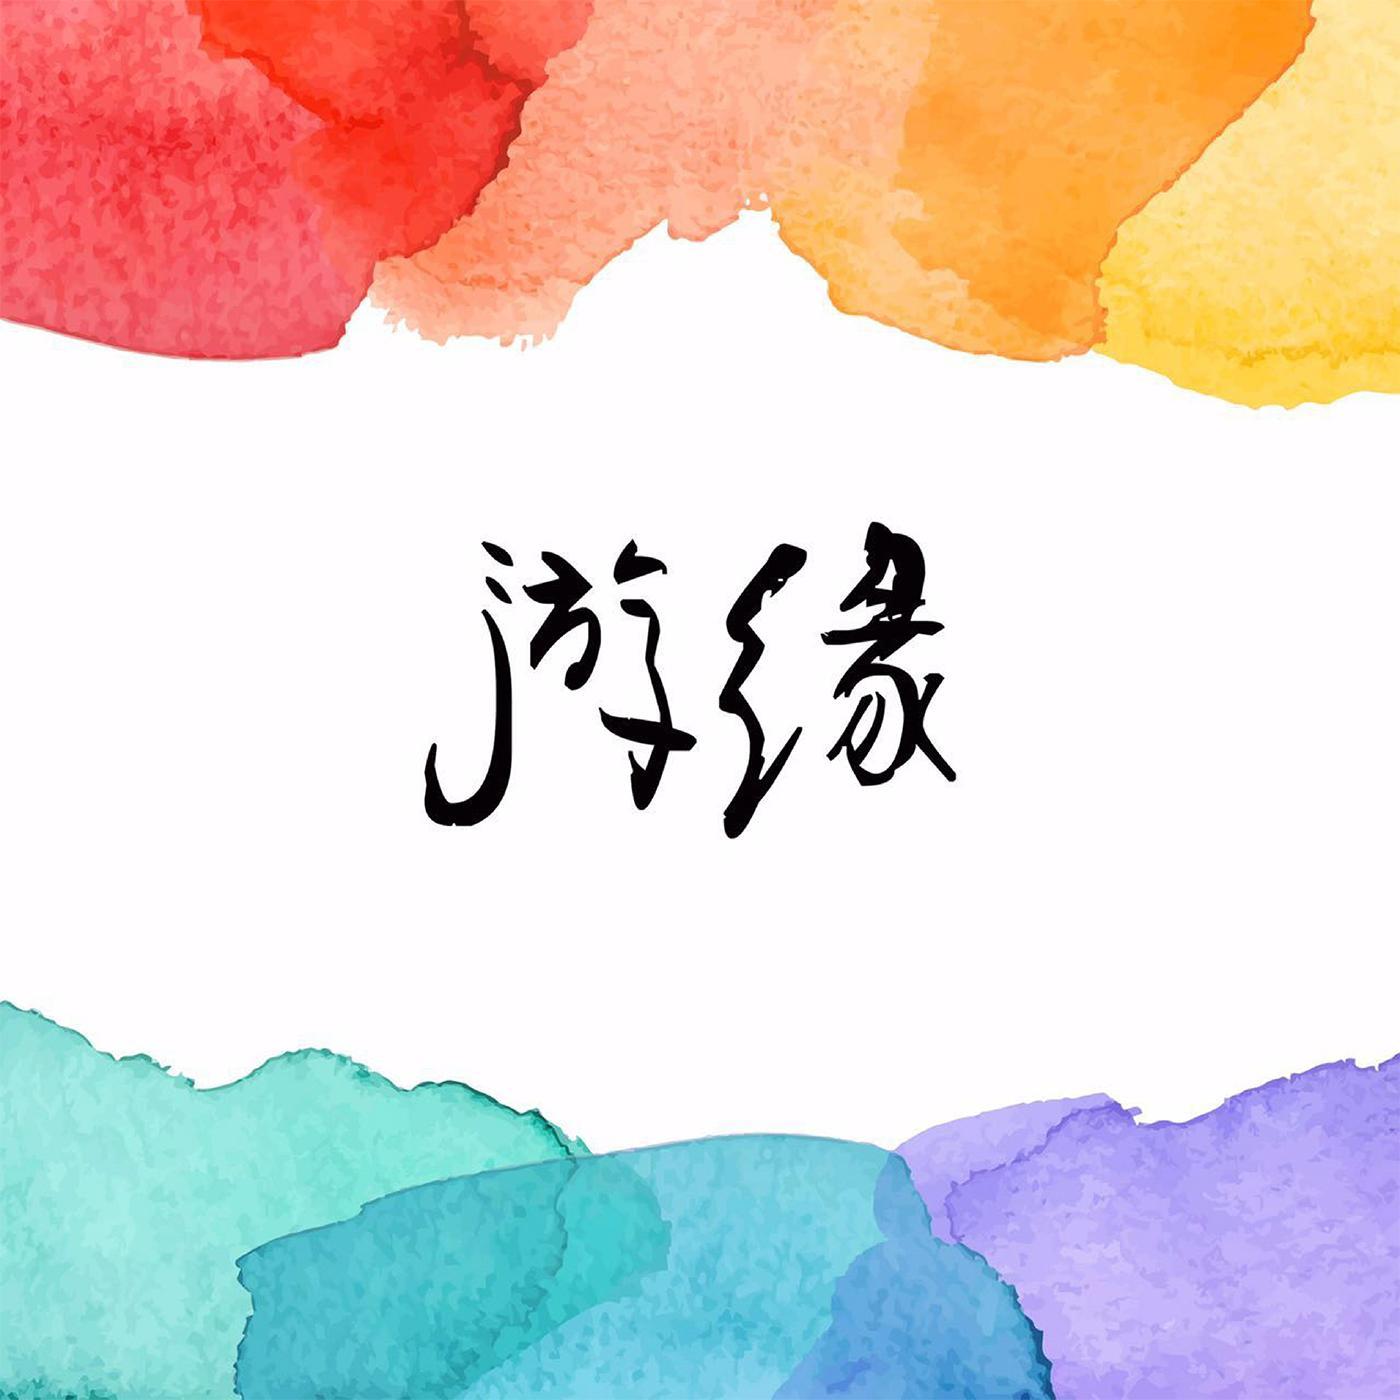 <![CDATA[游缘中国]]>